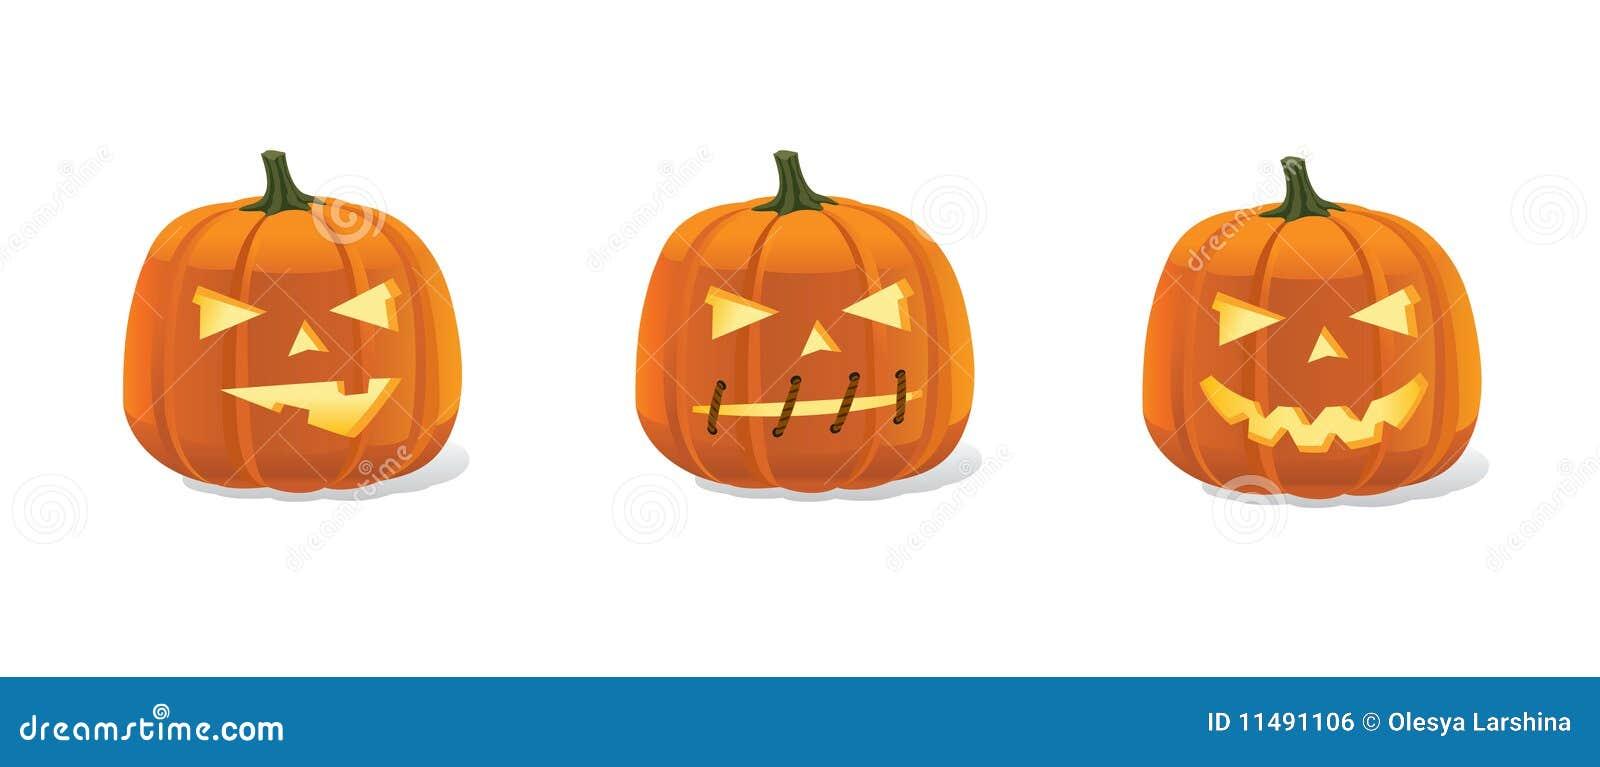 Halloween Pumpkins Smileys Set With Luminous Eyes Royalty